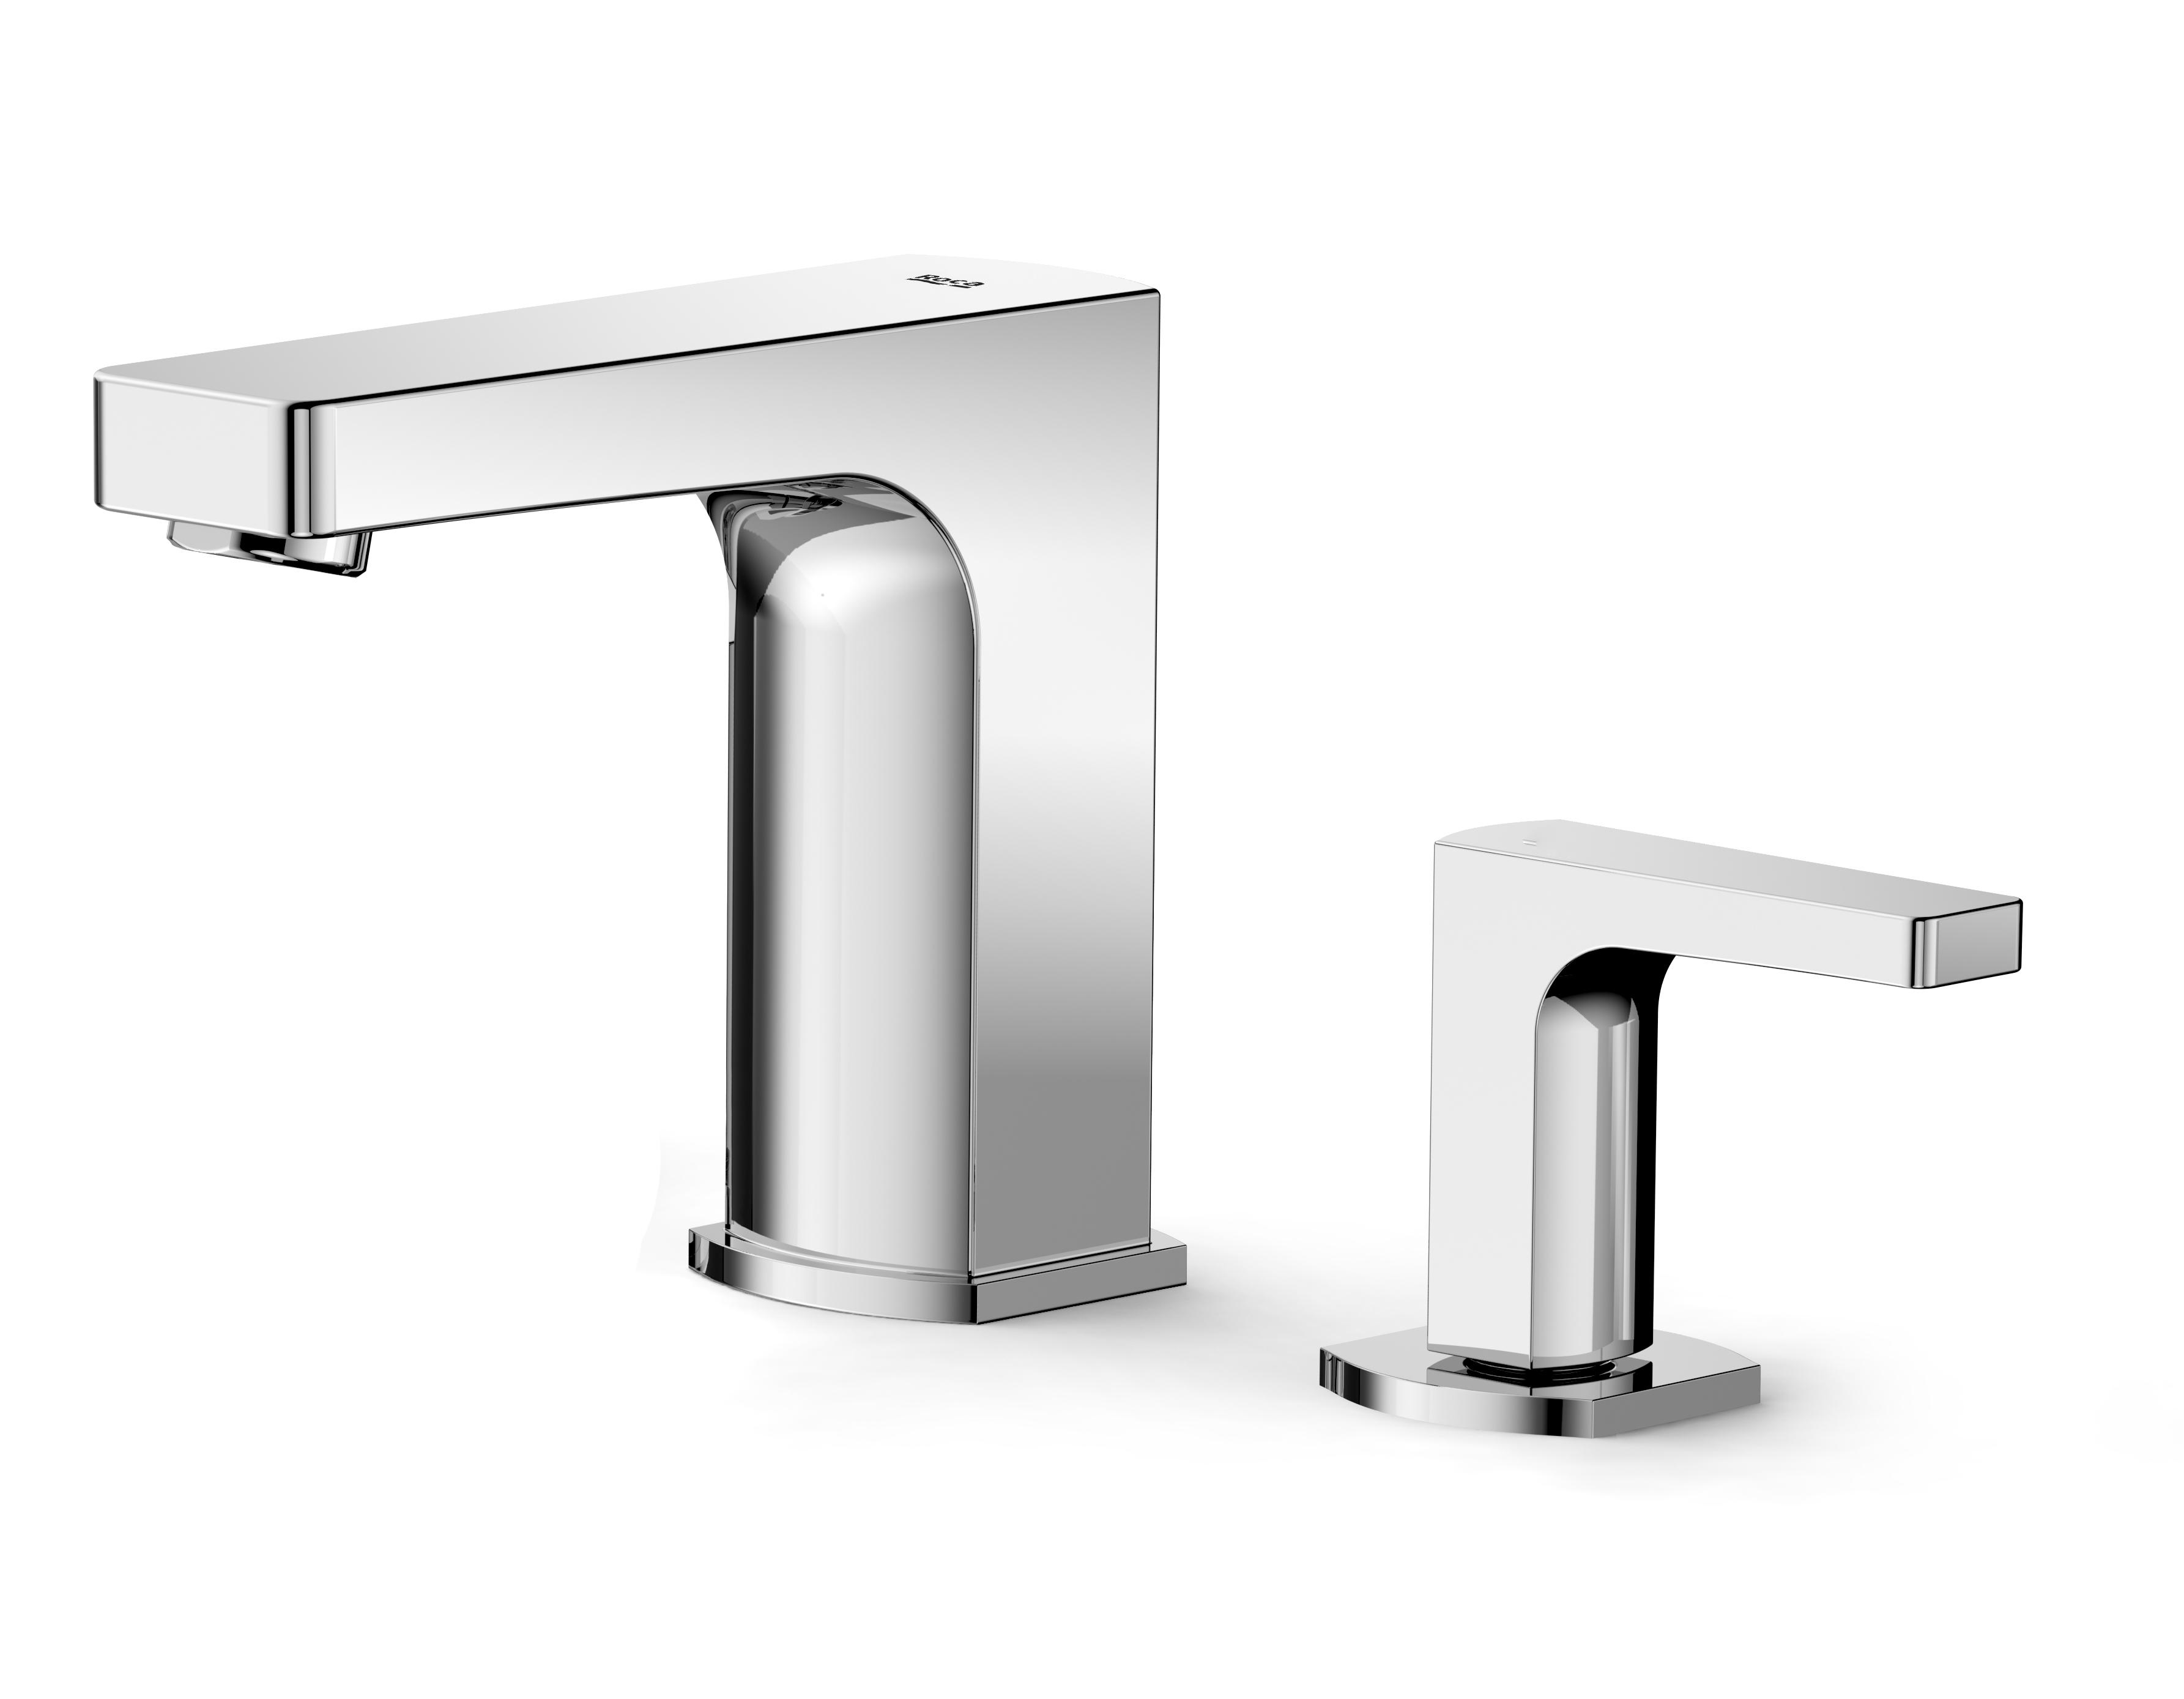 Ducha manual blog com orienta es e dicas de diversos for Ducha para lavatorio